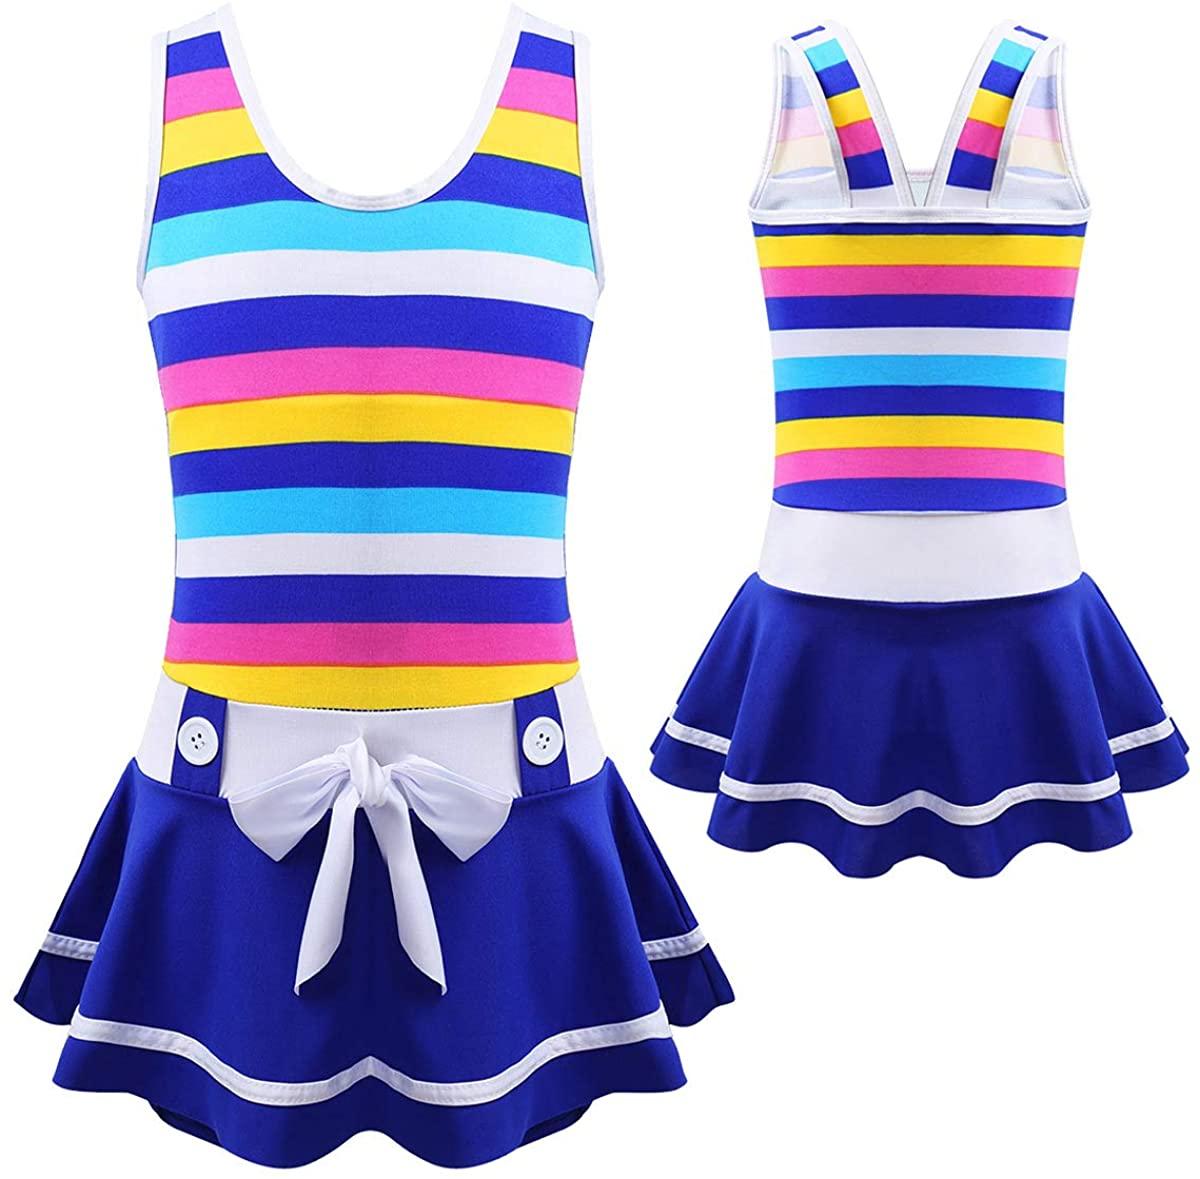 TiaoBug Kids Girls Sleeveless Straps Striped Swimsuit Summer Holiday Bather Bowknot One-Piece Swimwear Set